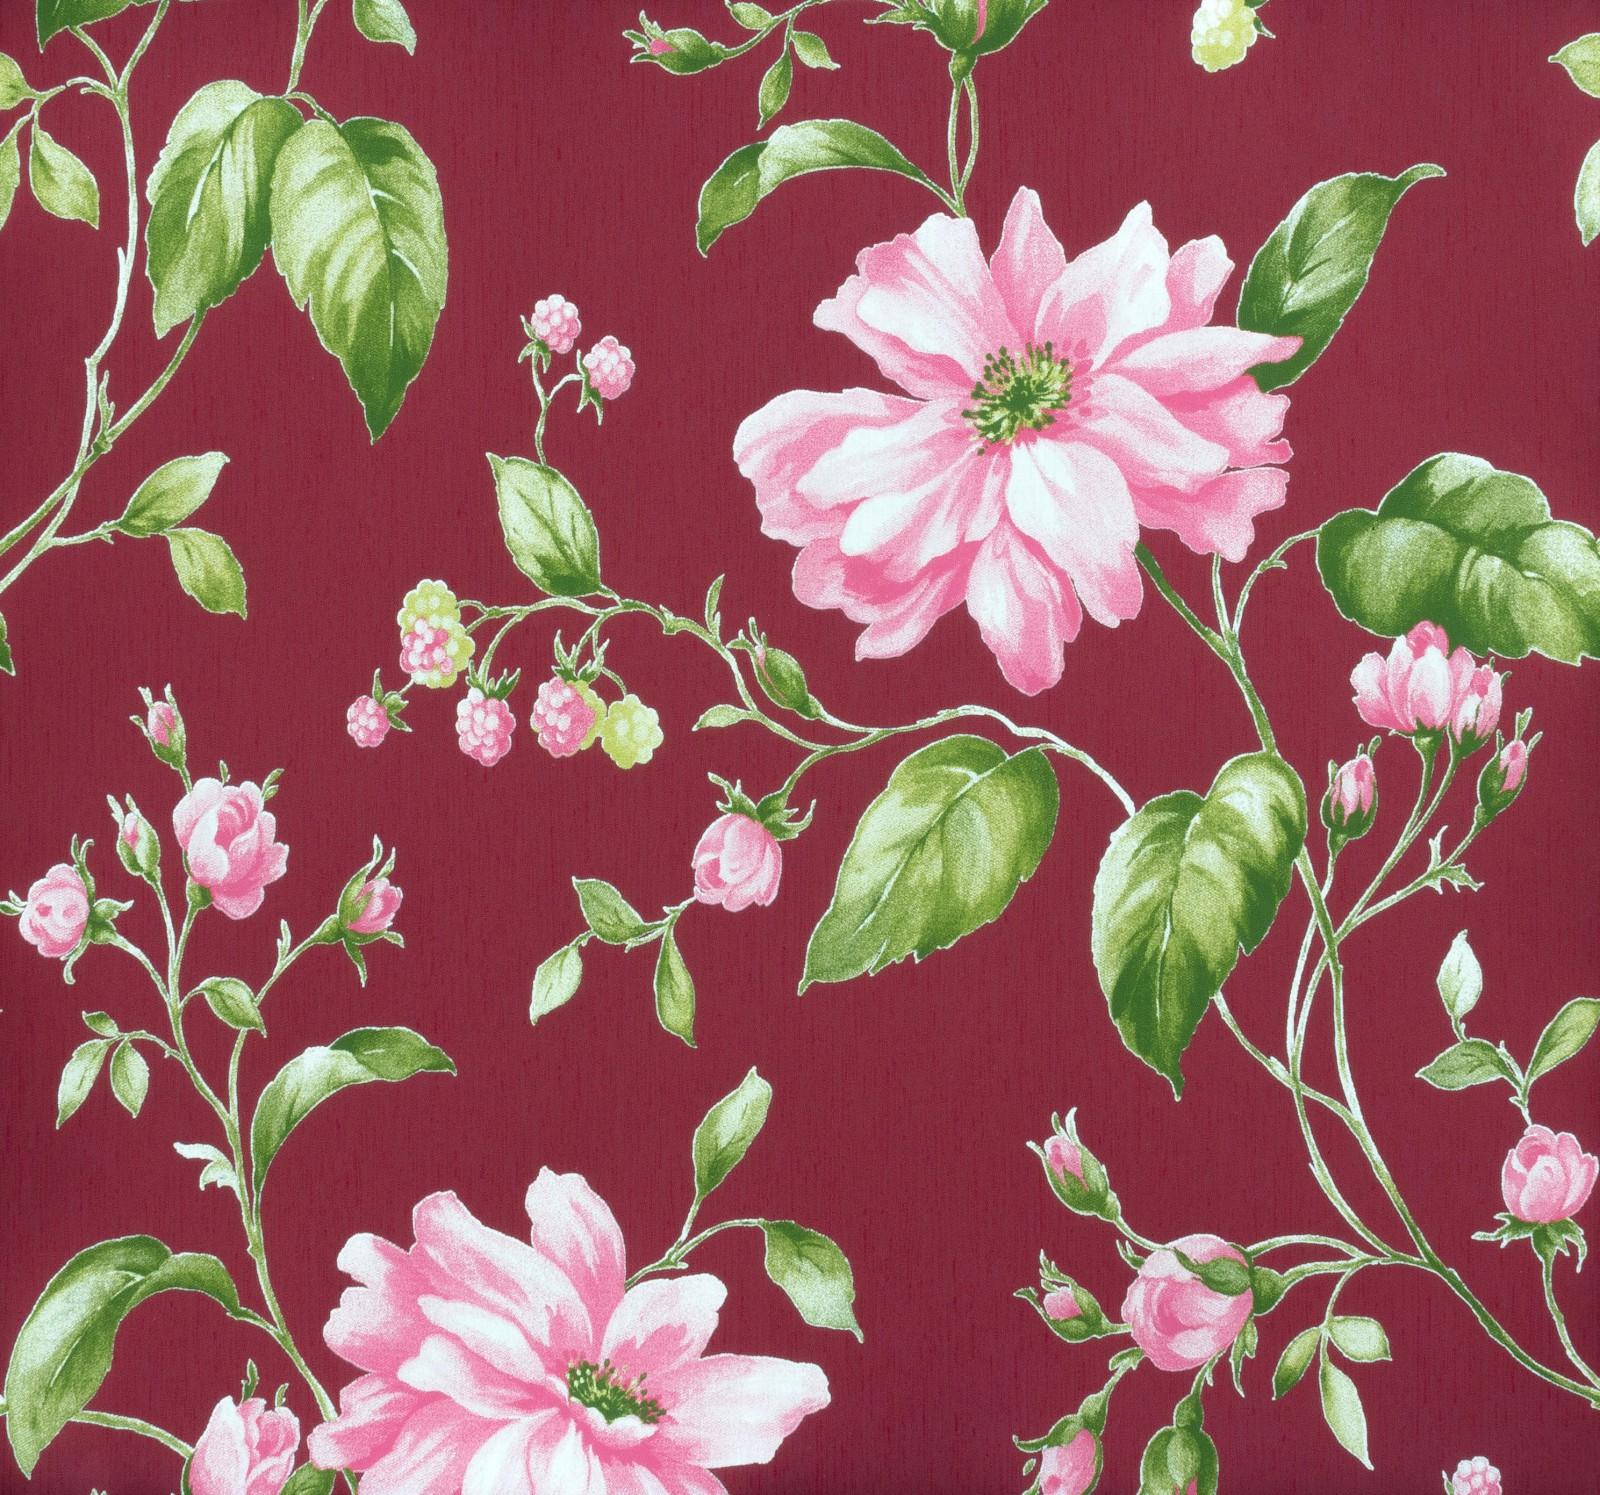 marburg tapete astoria vliestapete 53741 blumen bordeauxrot gr n rosa 3 74 1qm. Black Bedroom Furniture Sets. Home Design Ideas